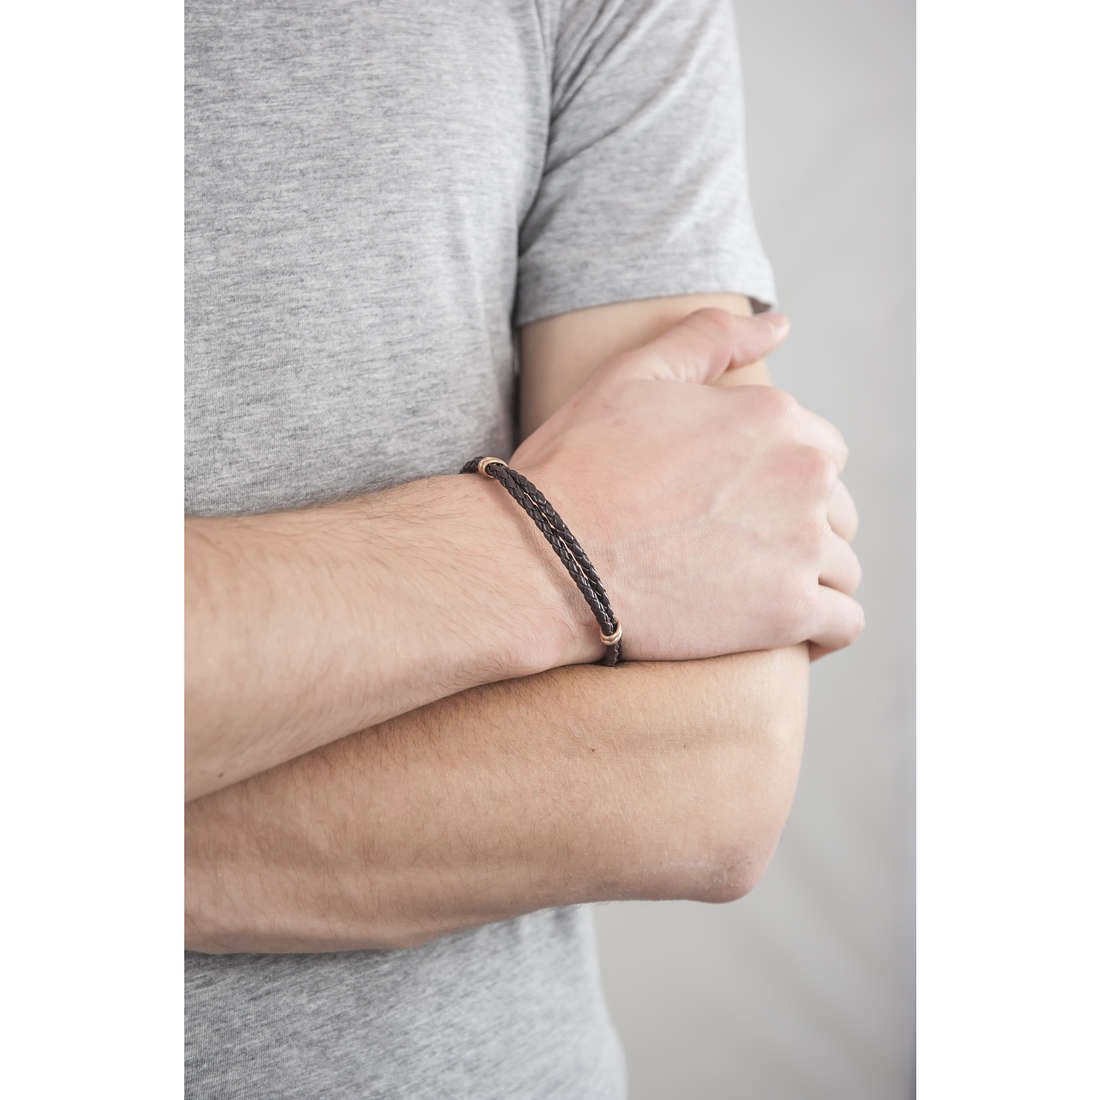 Morellato bracciali Ocean uomo SABR03 indosso